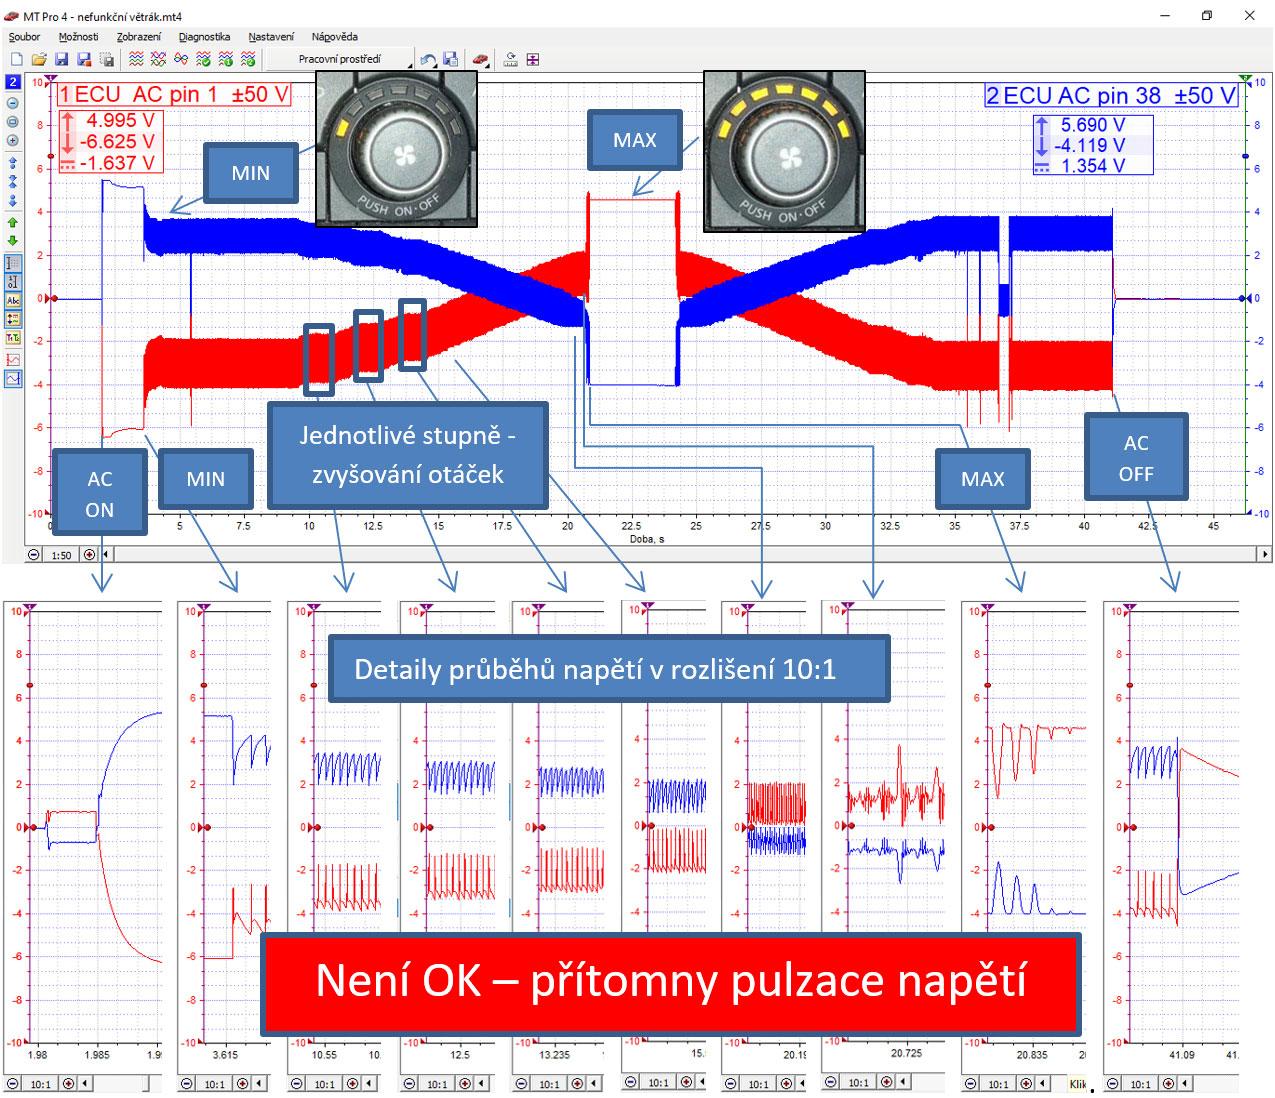 Nissan_Oscilogram-mtpro-01